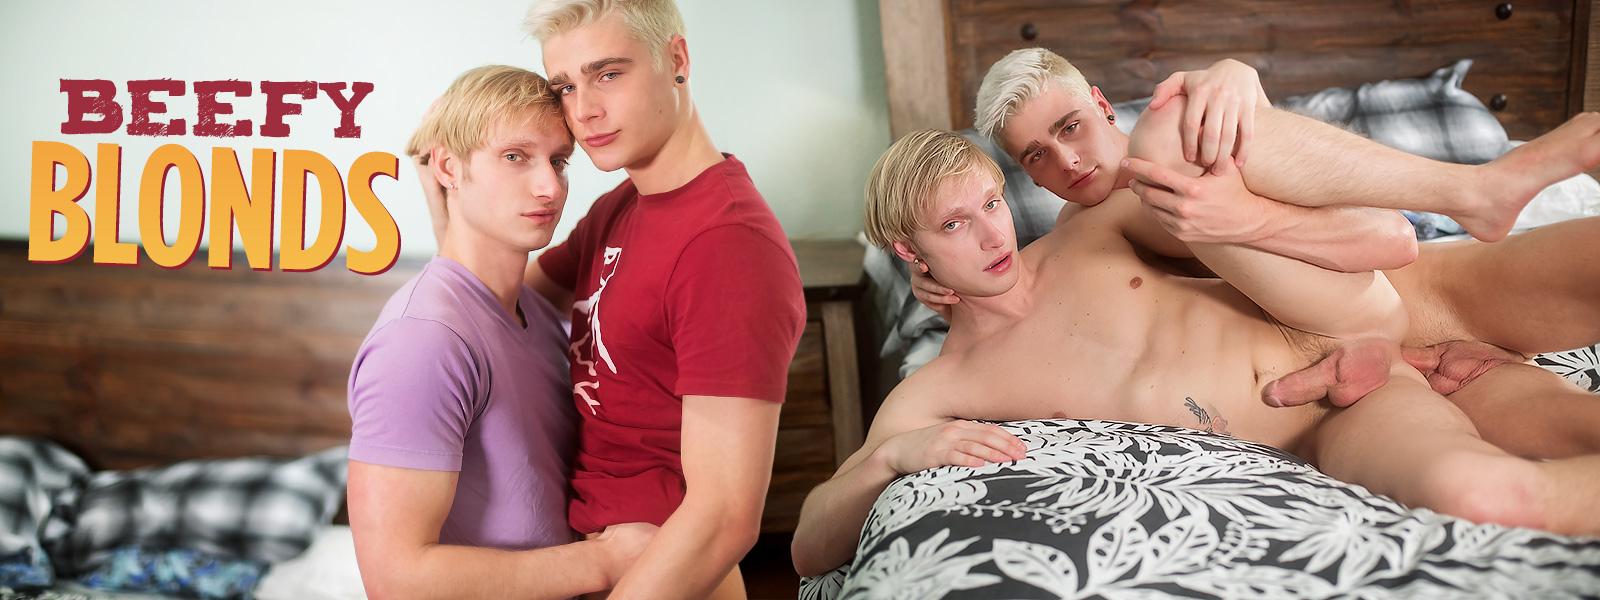 Beefy Blonds